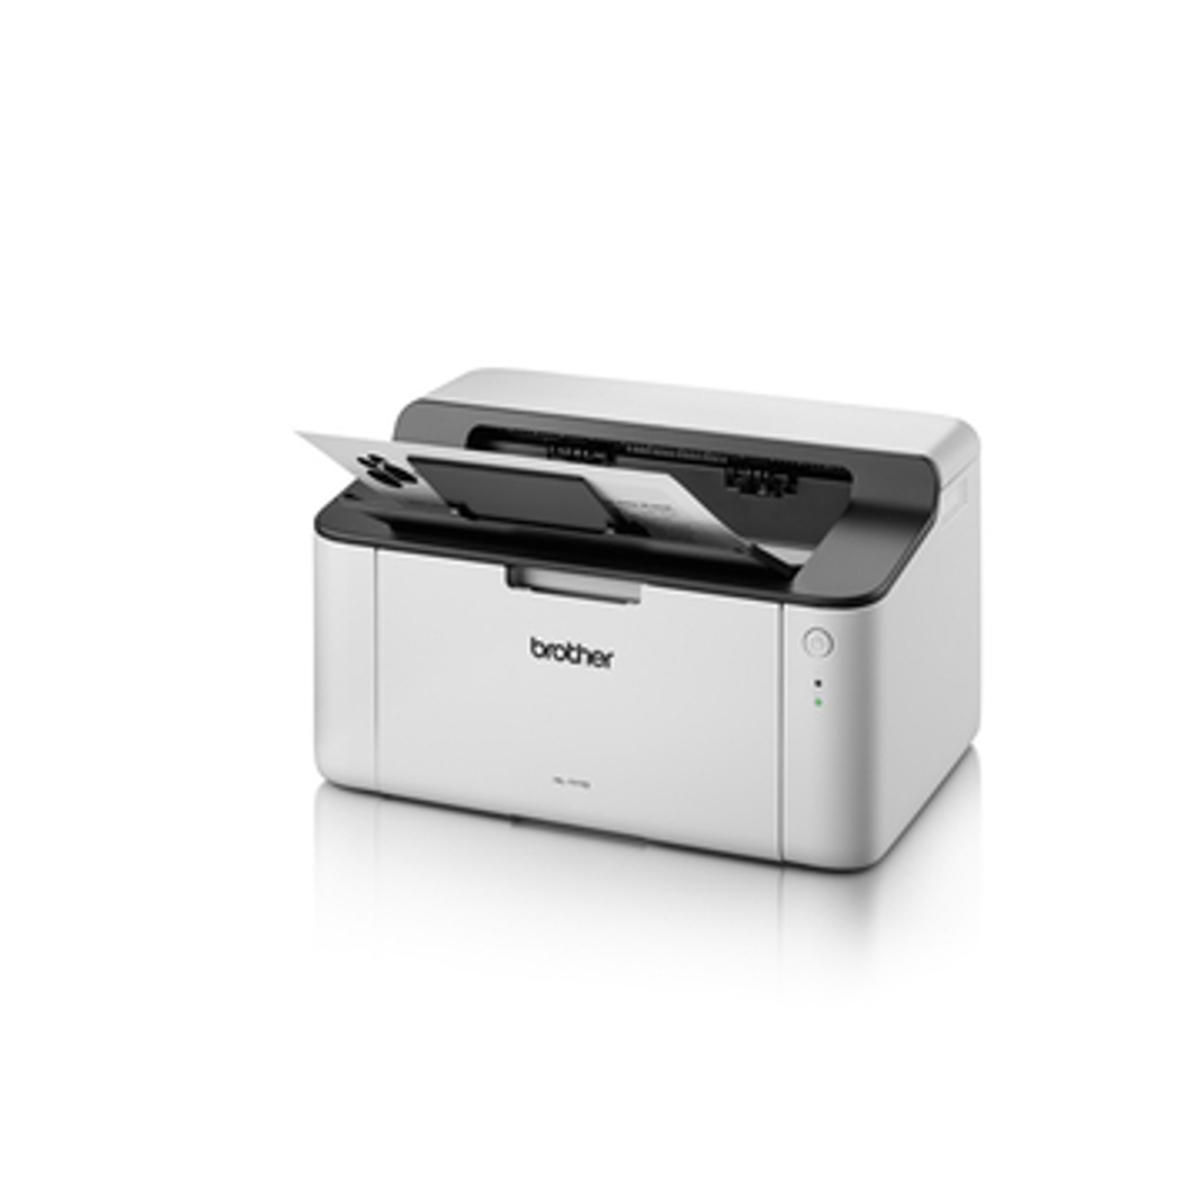 Impresora Brother HL 1110